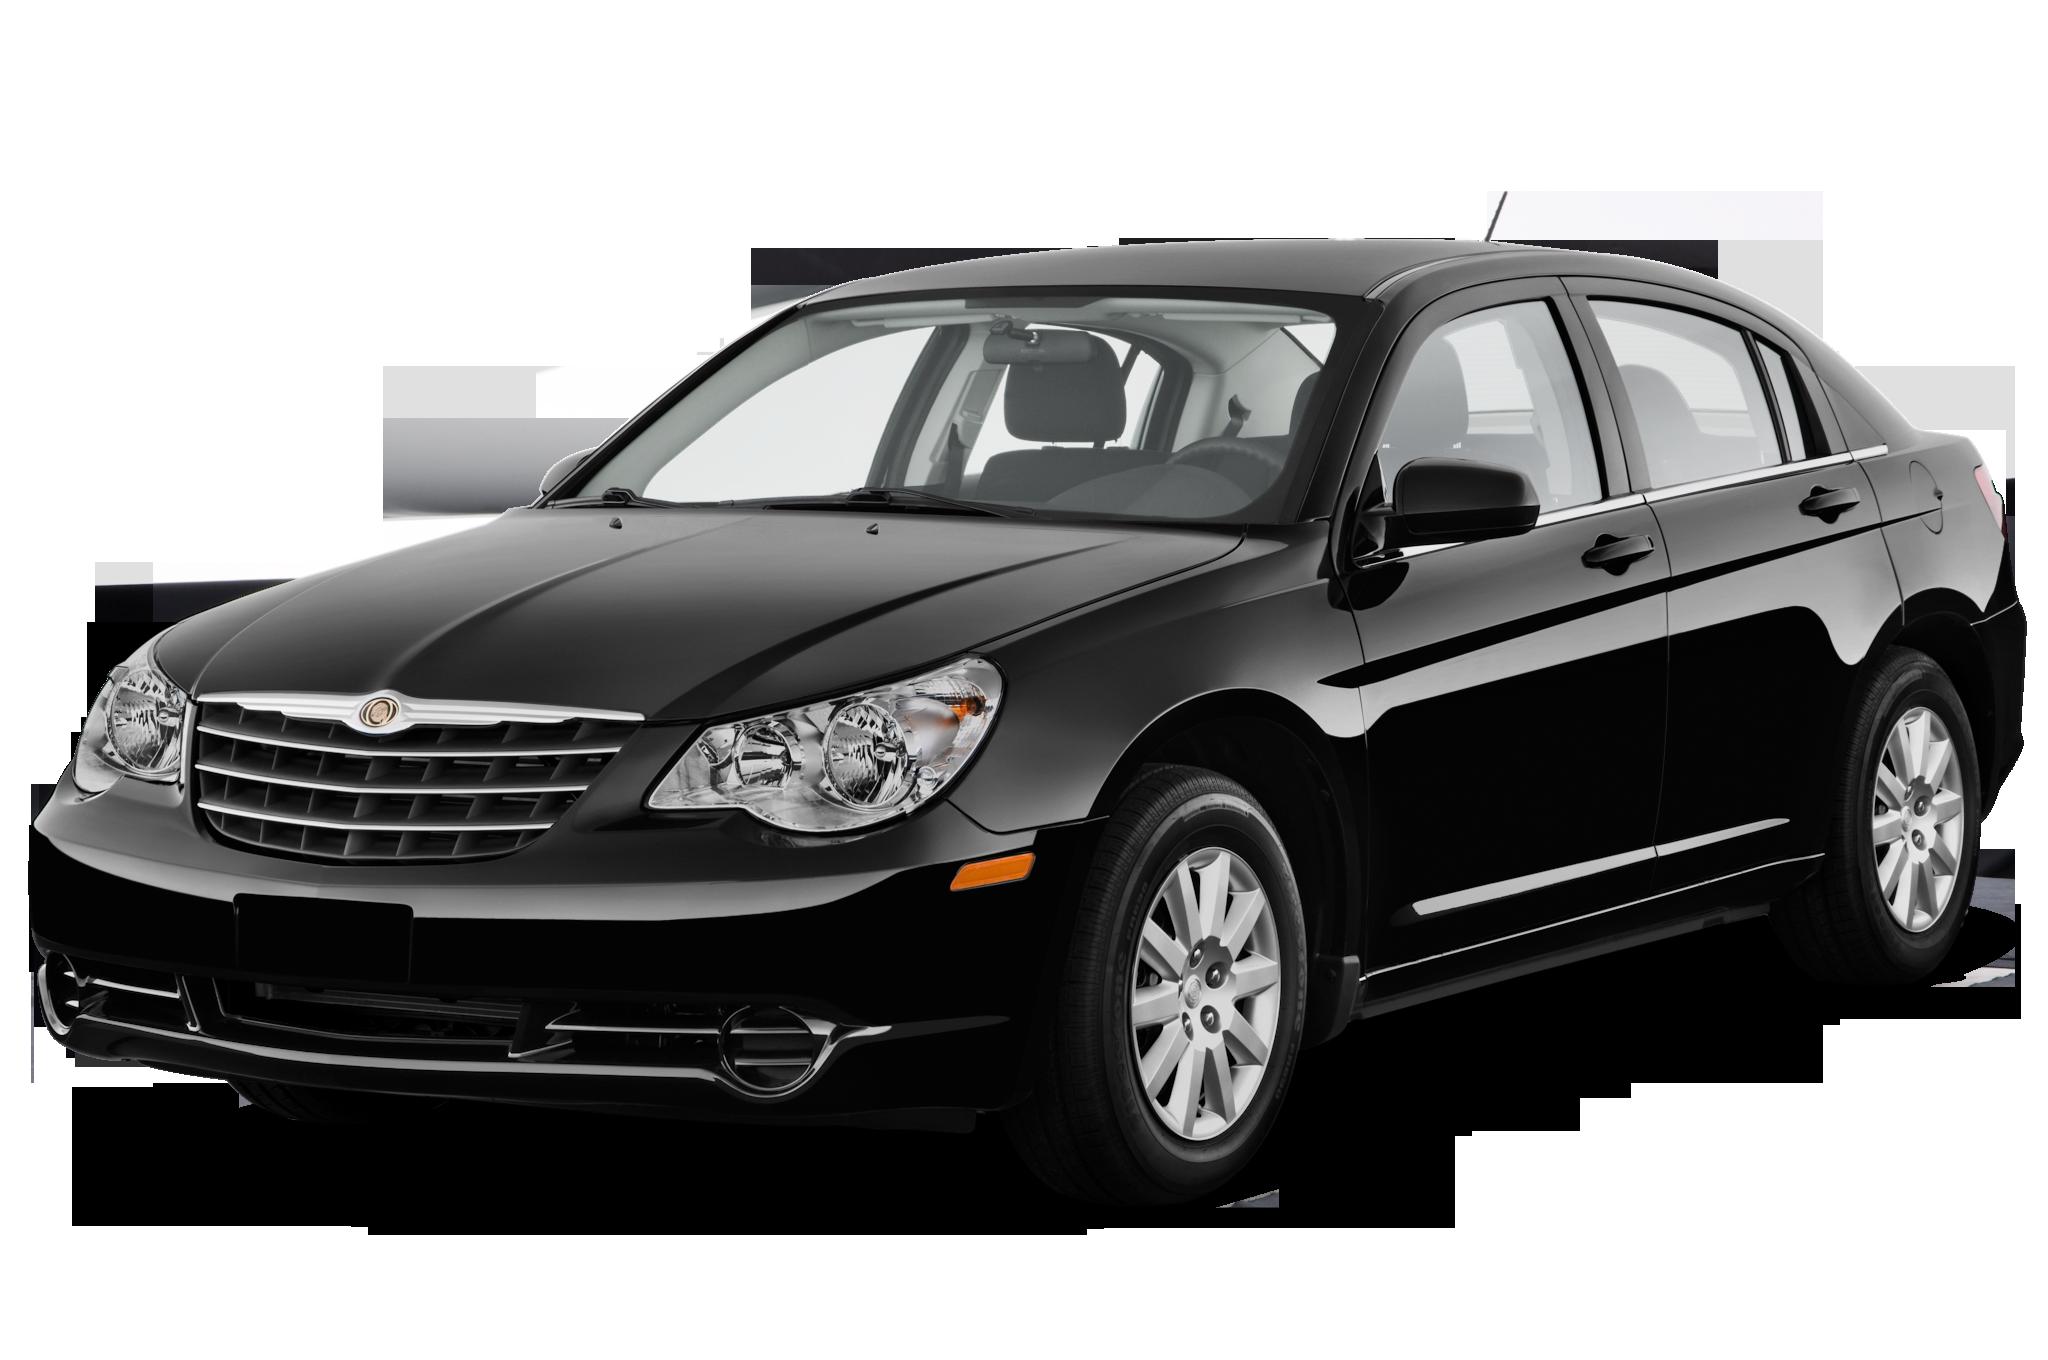 truecar discounts 2010 chrysler sebring 2011 chevrolet impala and nissan brand most. Black Bedroom Furniture Sets. Home Design Ideas